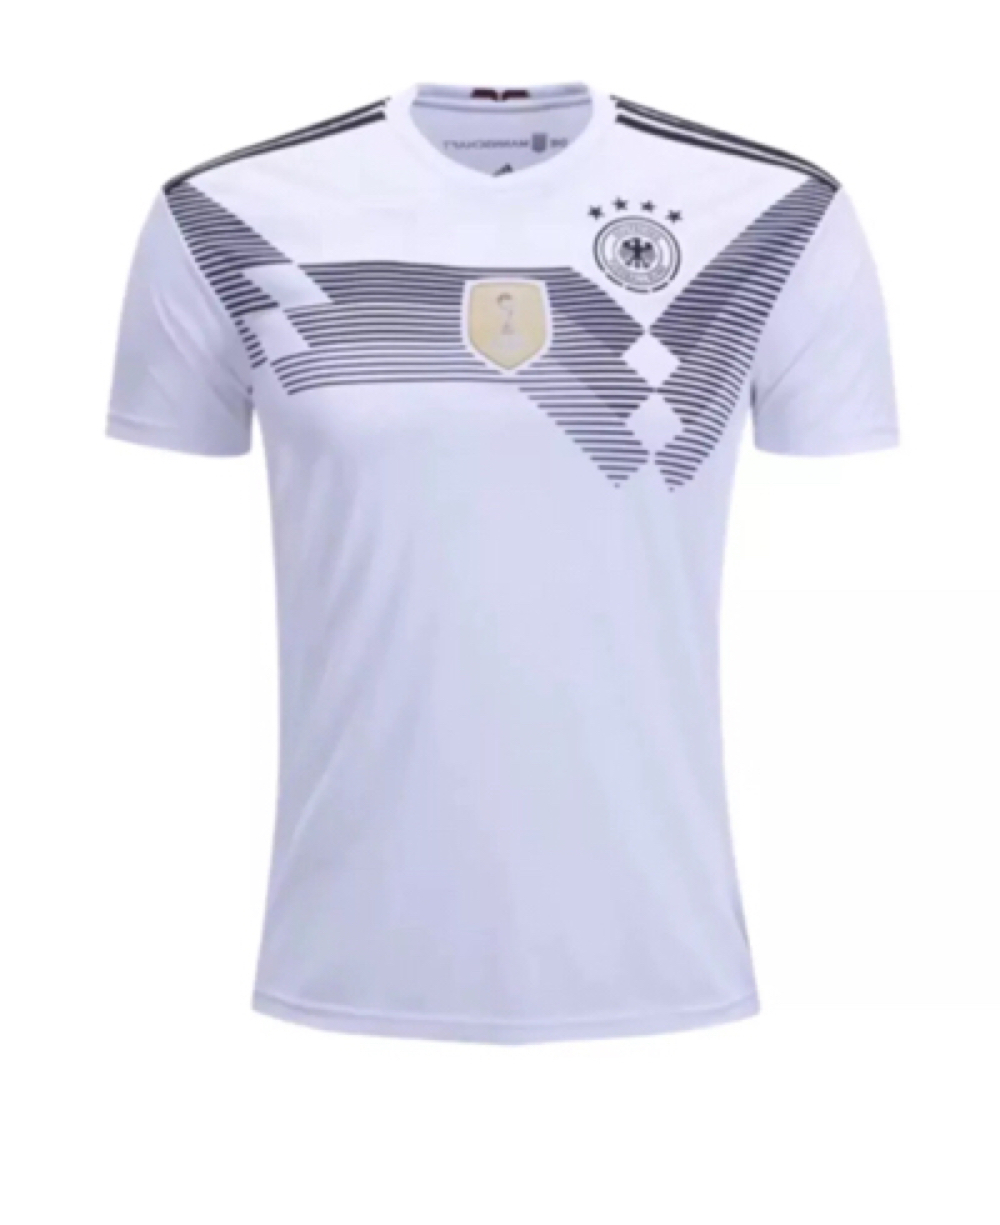 da62b11e3 Img 4607. Img 4607. Previous. 2018 World Cup Germany National Team Adidas  XXL BLANK Soccer Jersey